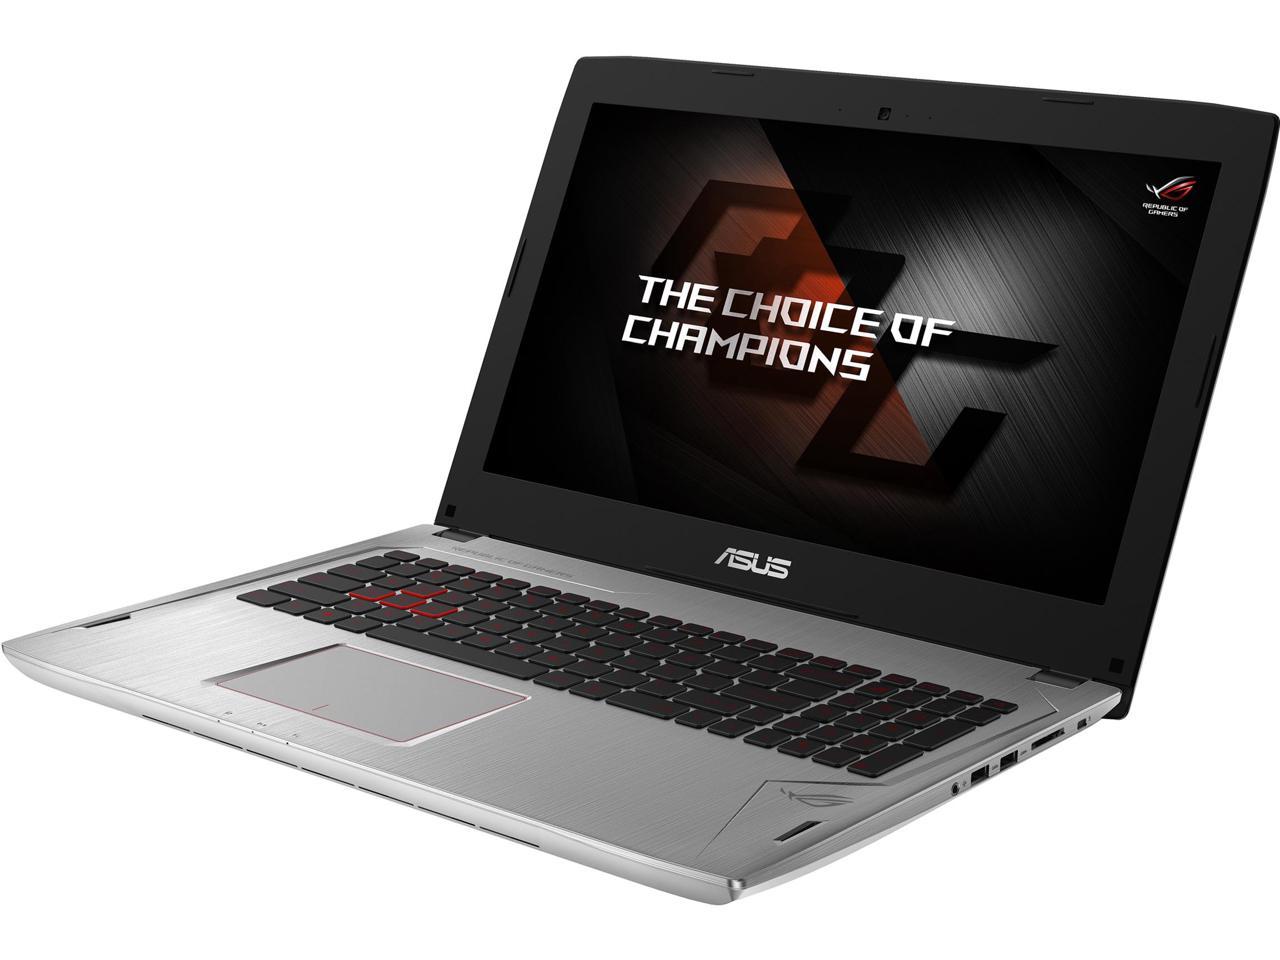 ASUS ROG GL502VM Gaming Laptop: 15.6'' FHD G-sync, i7-7700HQ, 16GB DDR4, 128GB SSD, 1TB HDD, GTX 1060, Thunderbolt 3 @ $1150 with F/S $1149